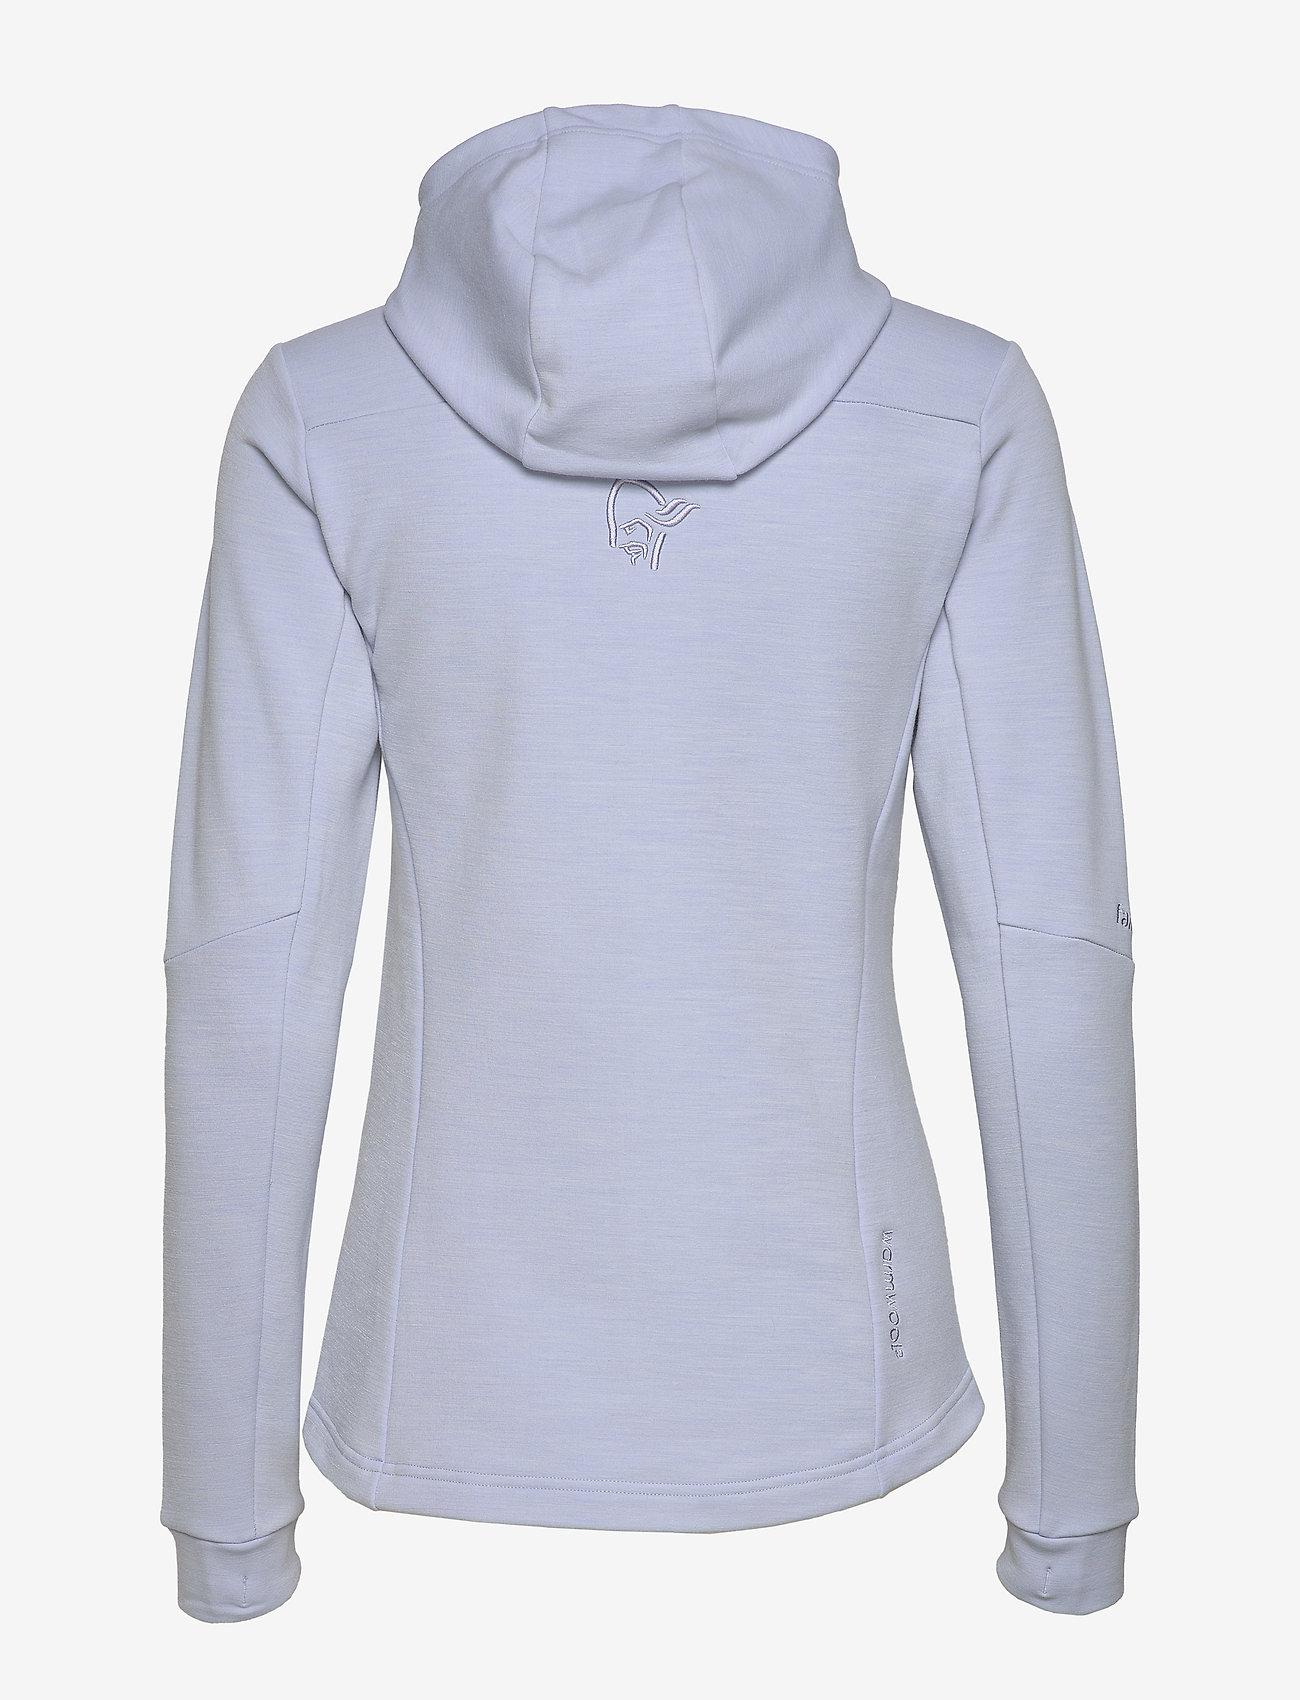 Falketind Warmwool2 Stretch Zip Hood W's (Serenity) - Norrøna azhnLF